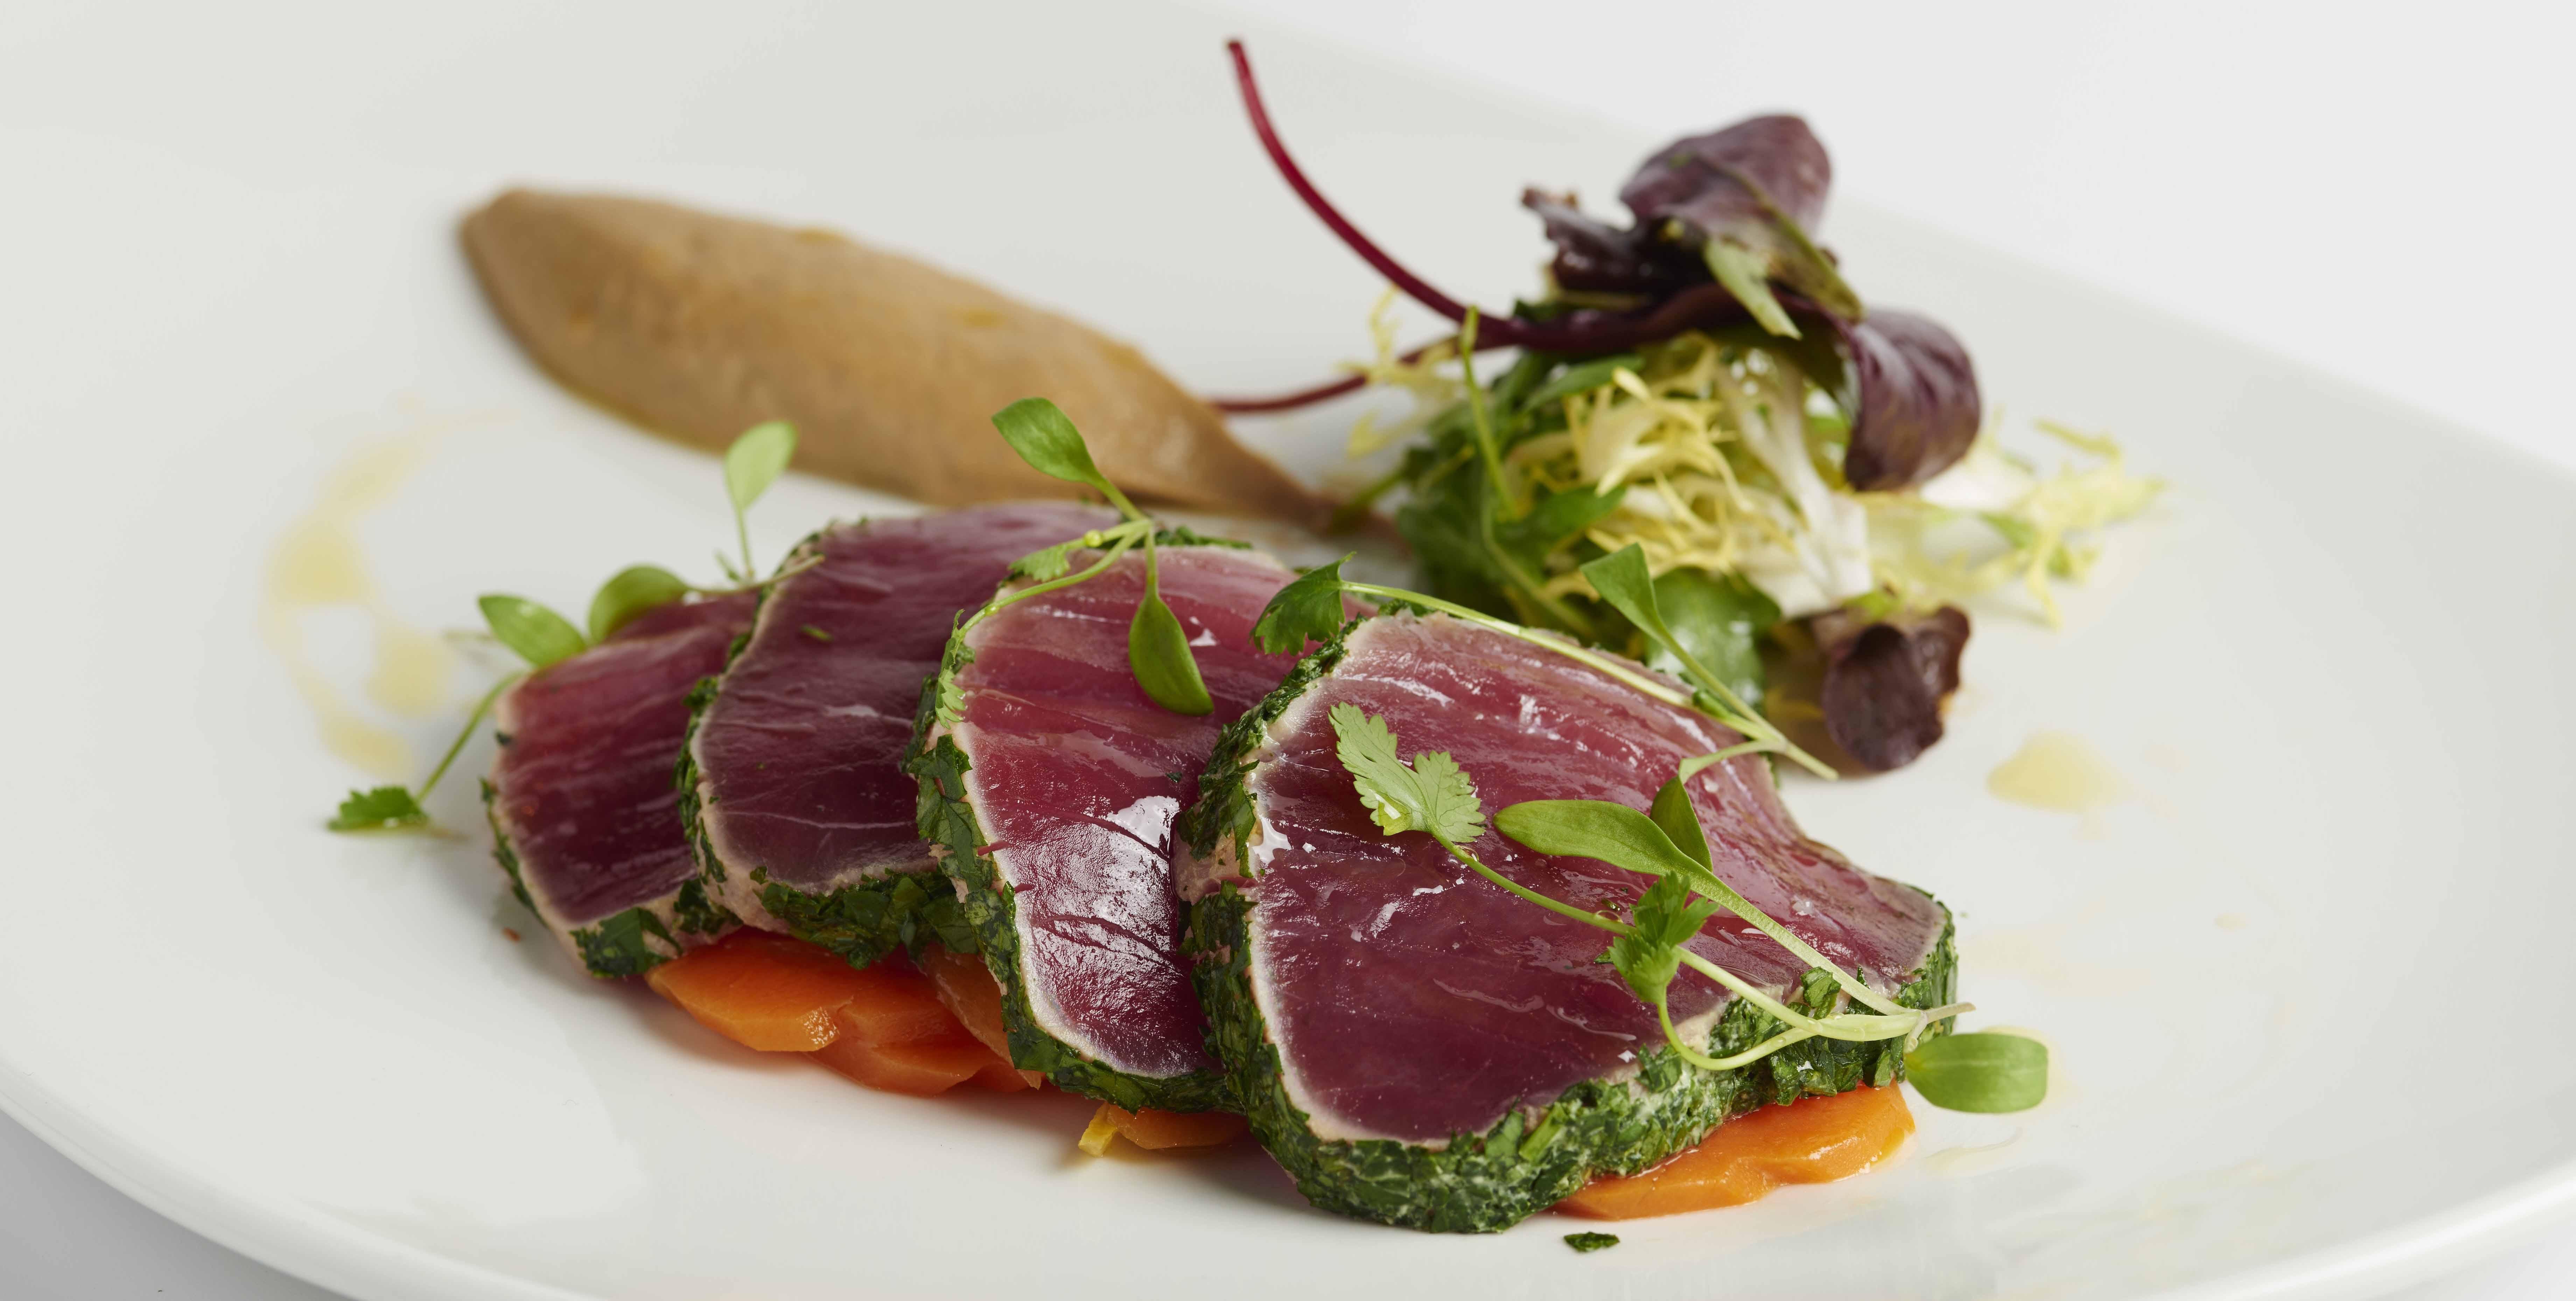 Yellowfin tuna with spiced aubergine